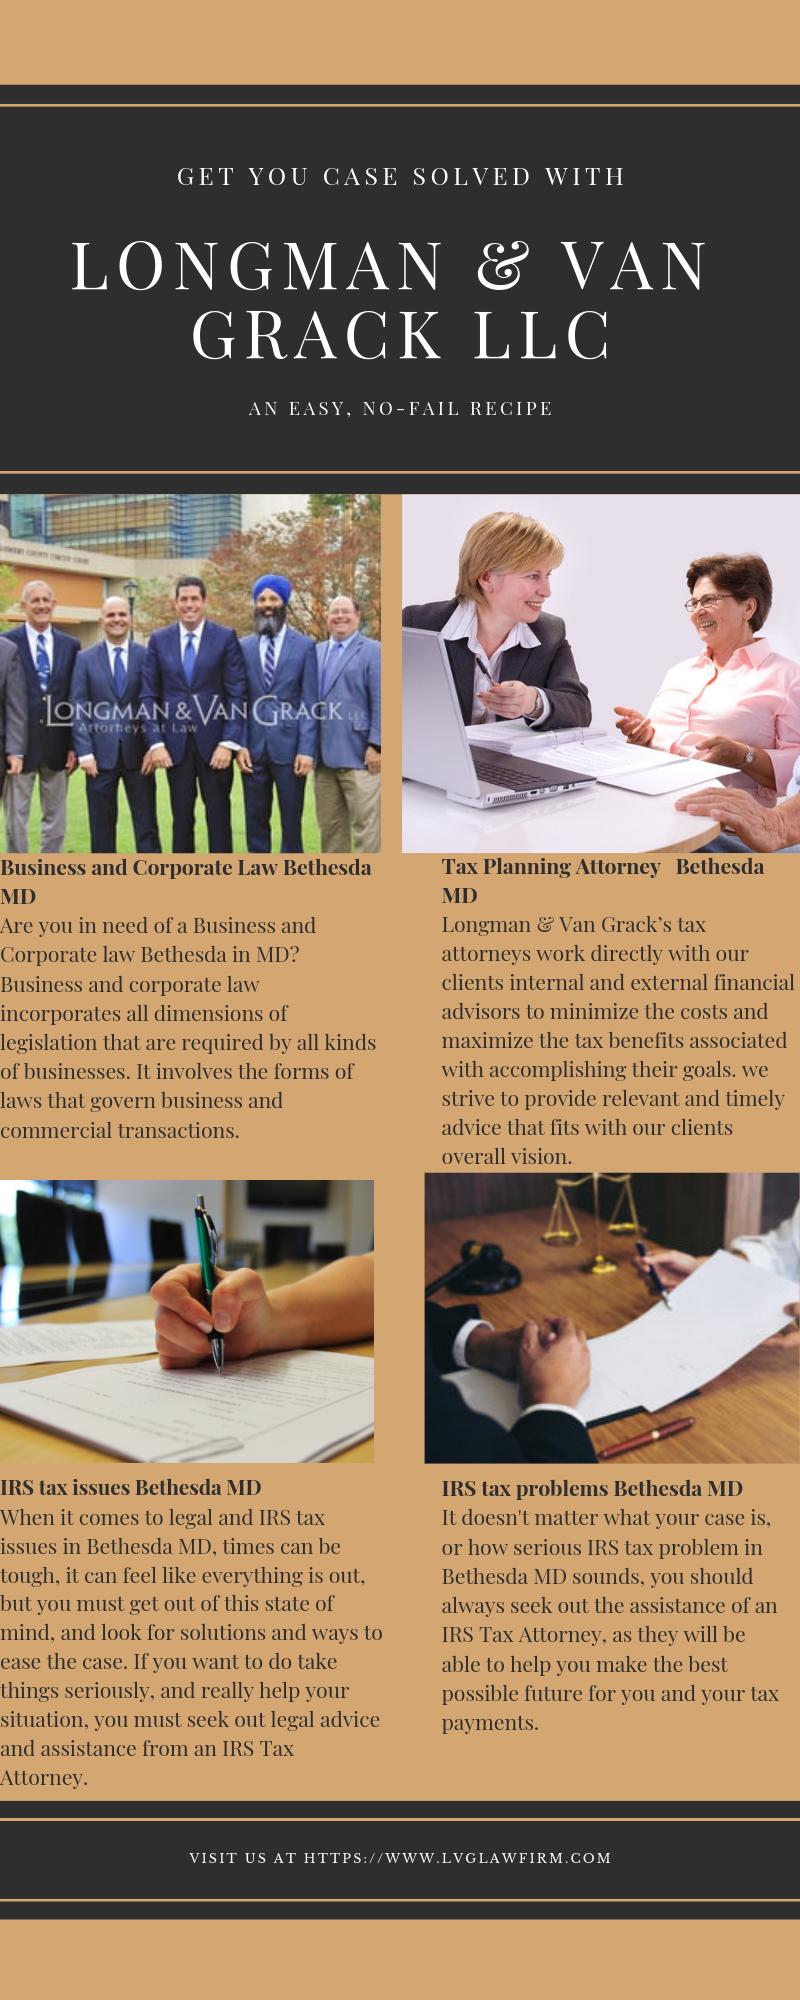 Tax Planning Attorney Bethesda MD - Corporate law, Attorneys, Tax attorney